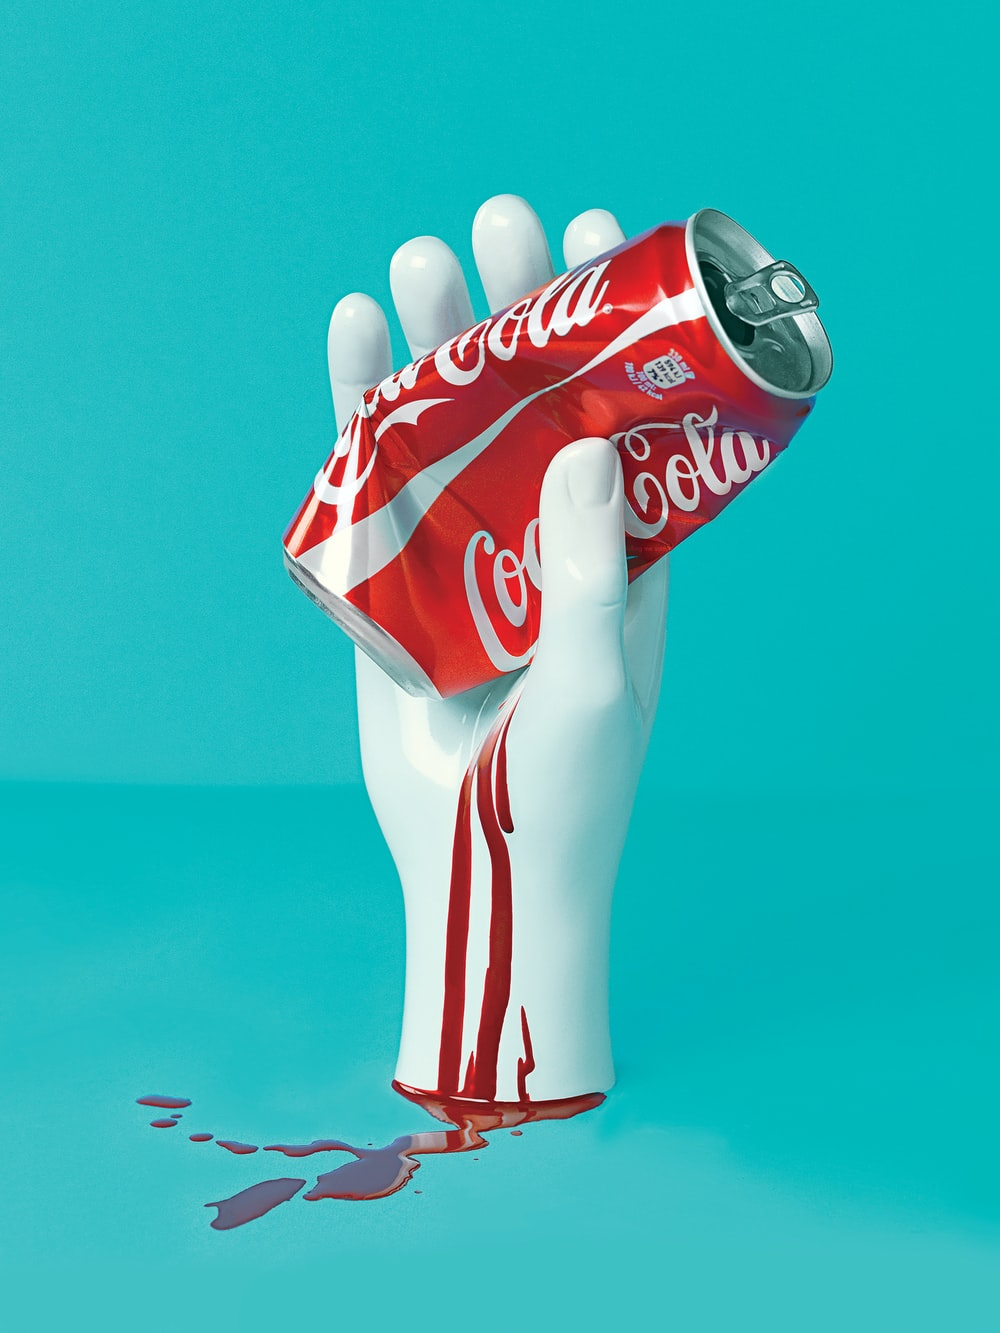 white hand holding Coca-Cola can statue